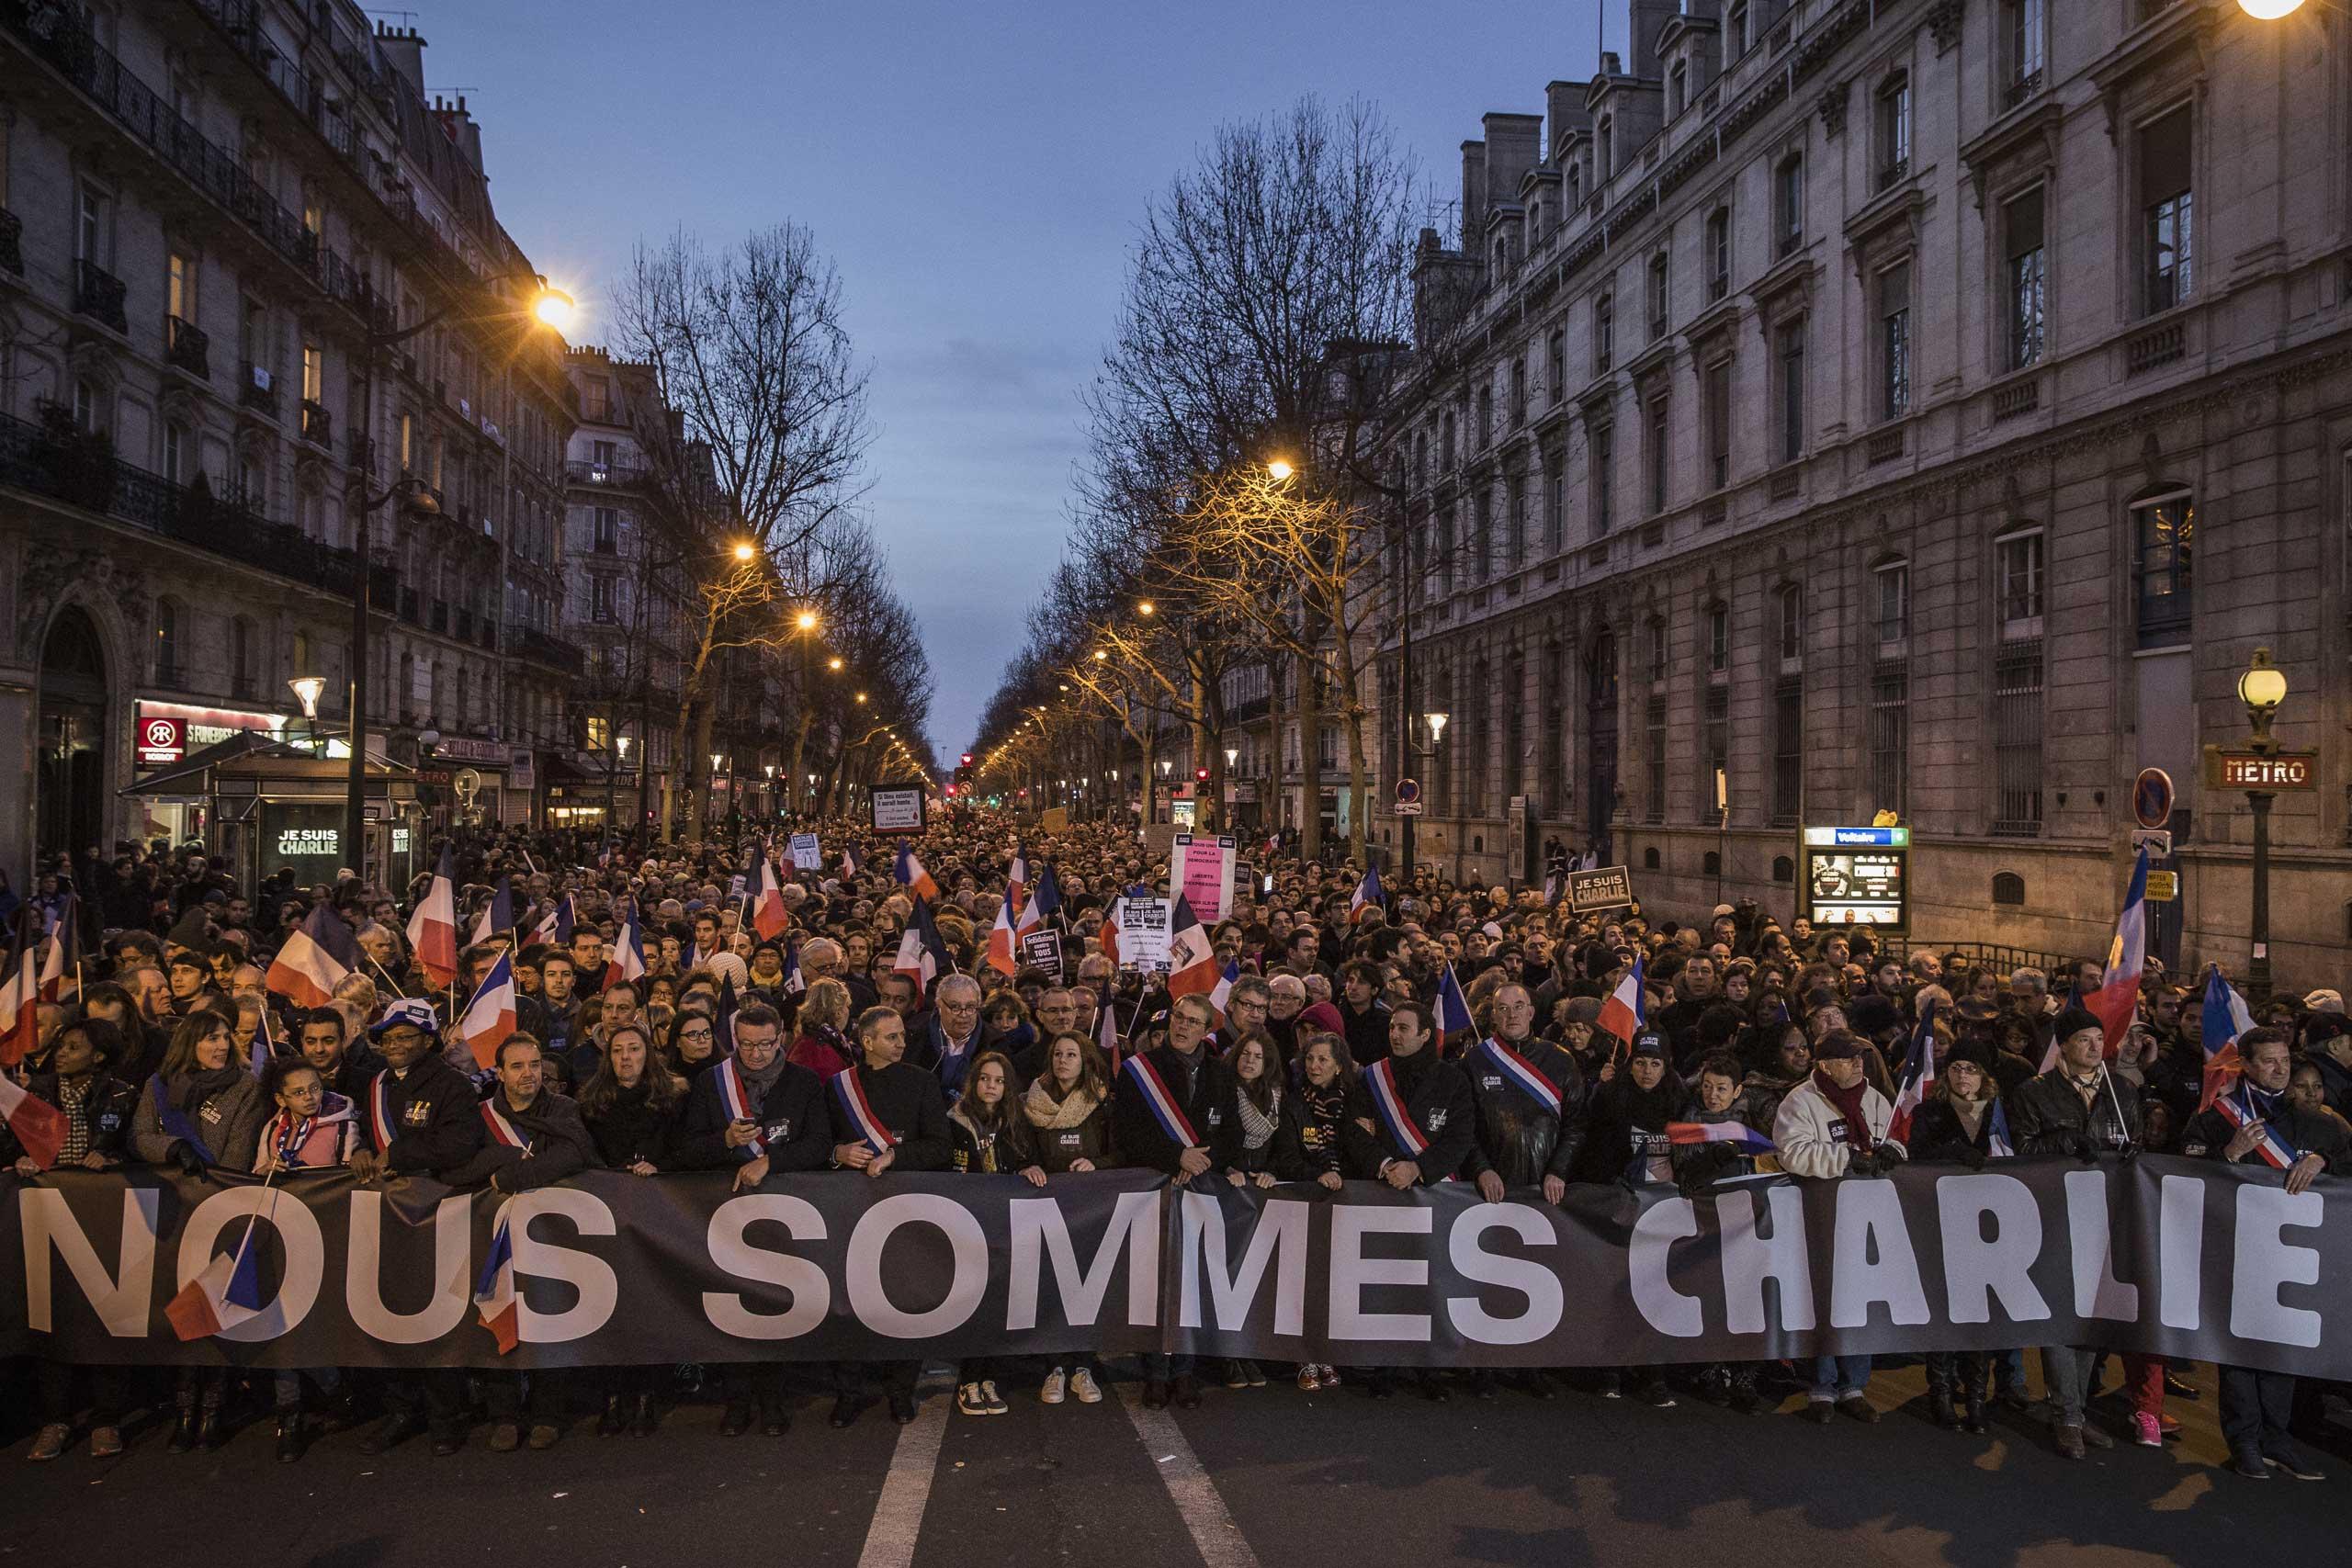 Demonstrators make their way along Place de la République during a mass unity rally following the recent terrorist attacks on Jan. 11, 2015 in Paris.